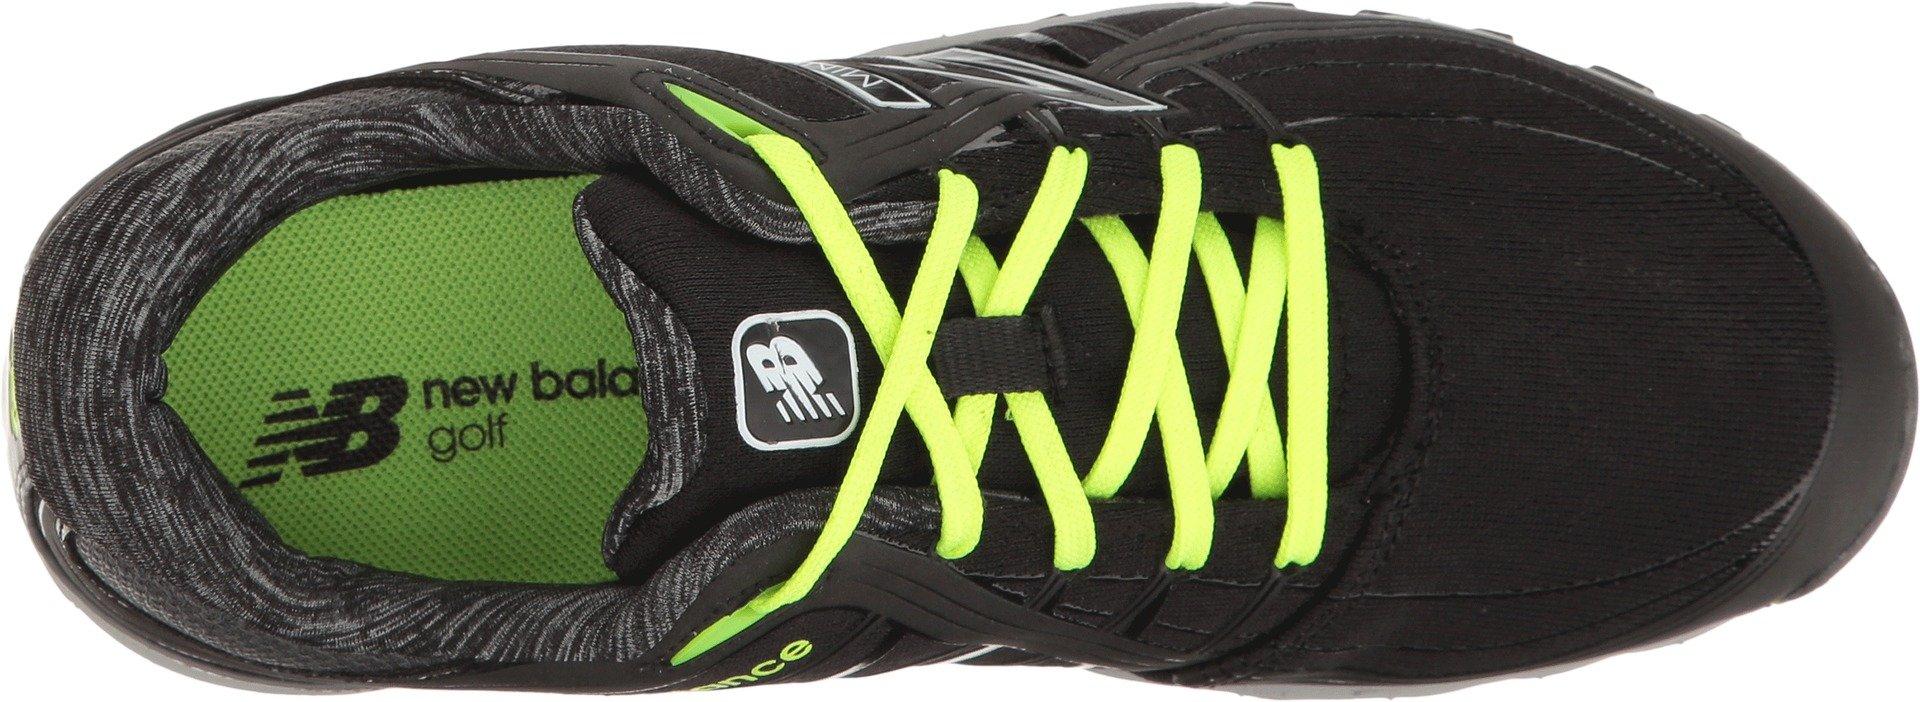 New Balance Women's nbgw1005 Golf Shoe, Black/Lime, 7.5 B US by New Balance (Image #2)